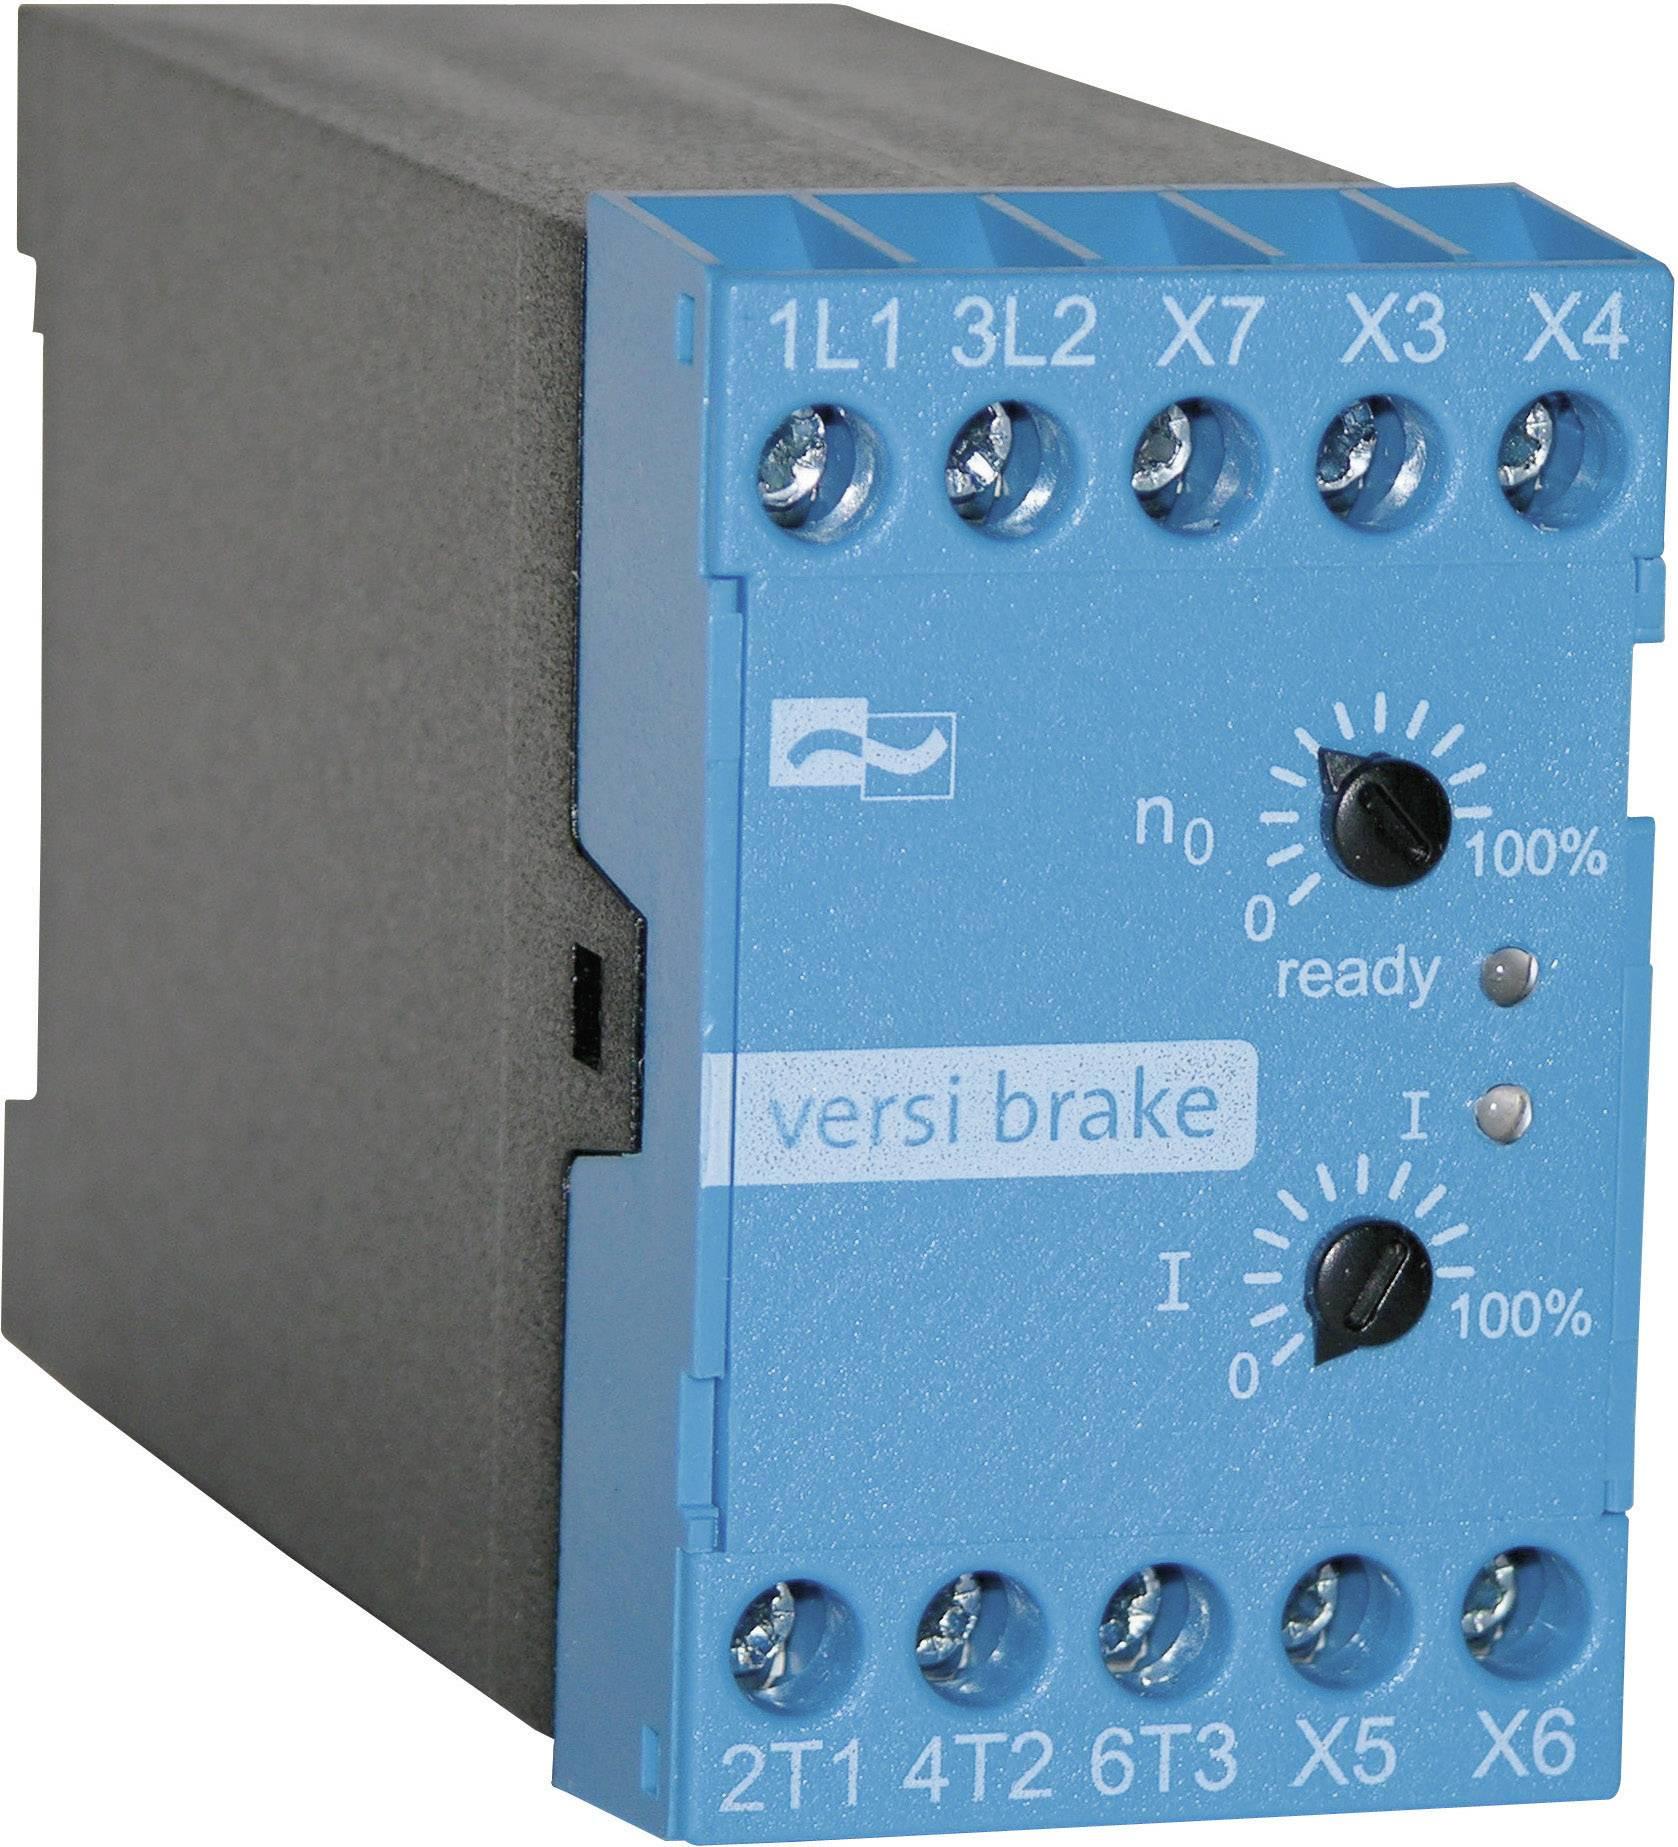 Brzdový systém Peter Electronic VB 400-30L (2B000.40030)